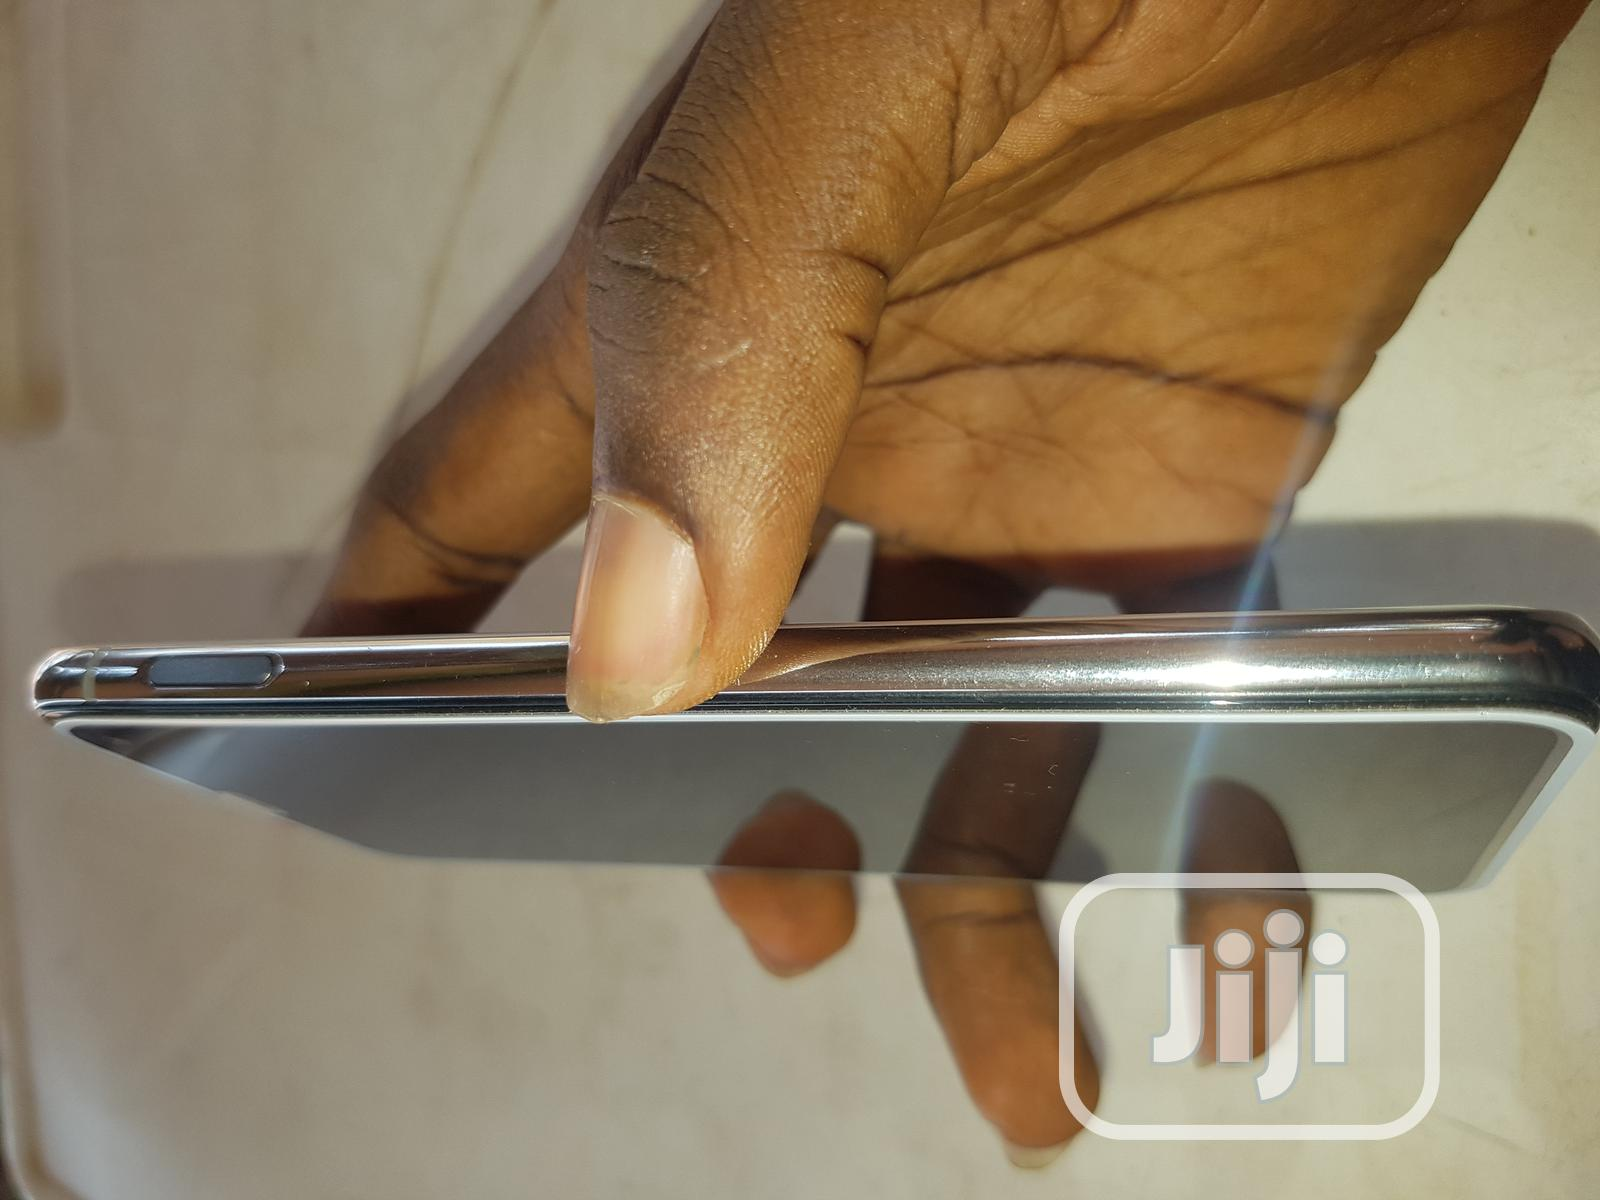 Samsung Galaxy S10e 128 GB | Mobile Phones for sale in Benin City, Edo State, Nigeria